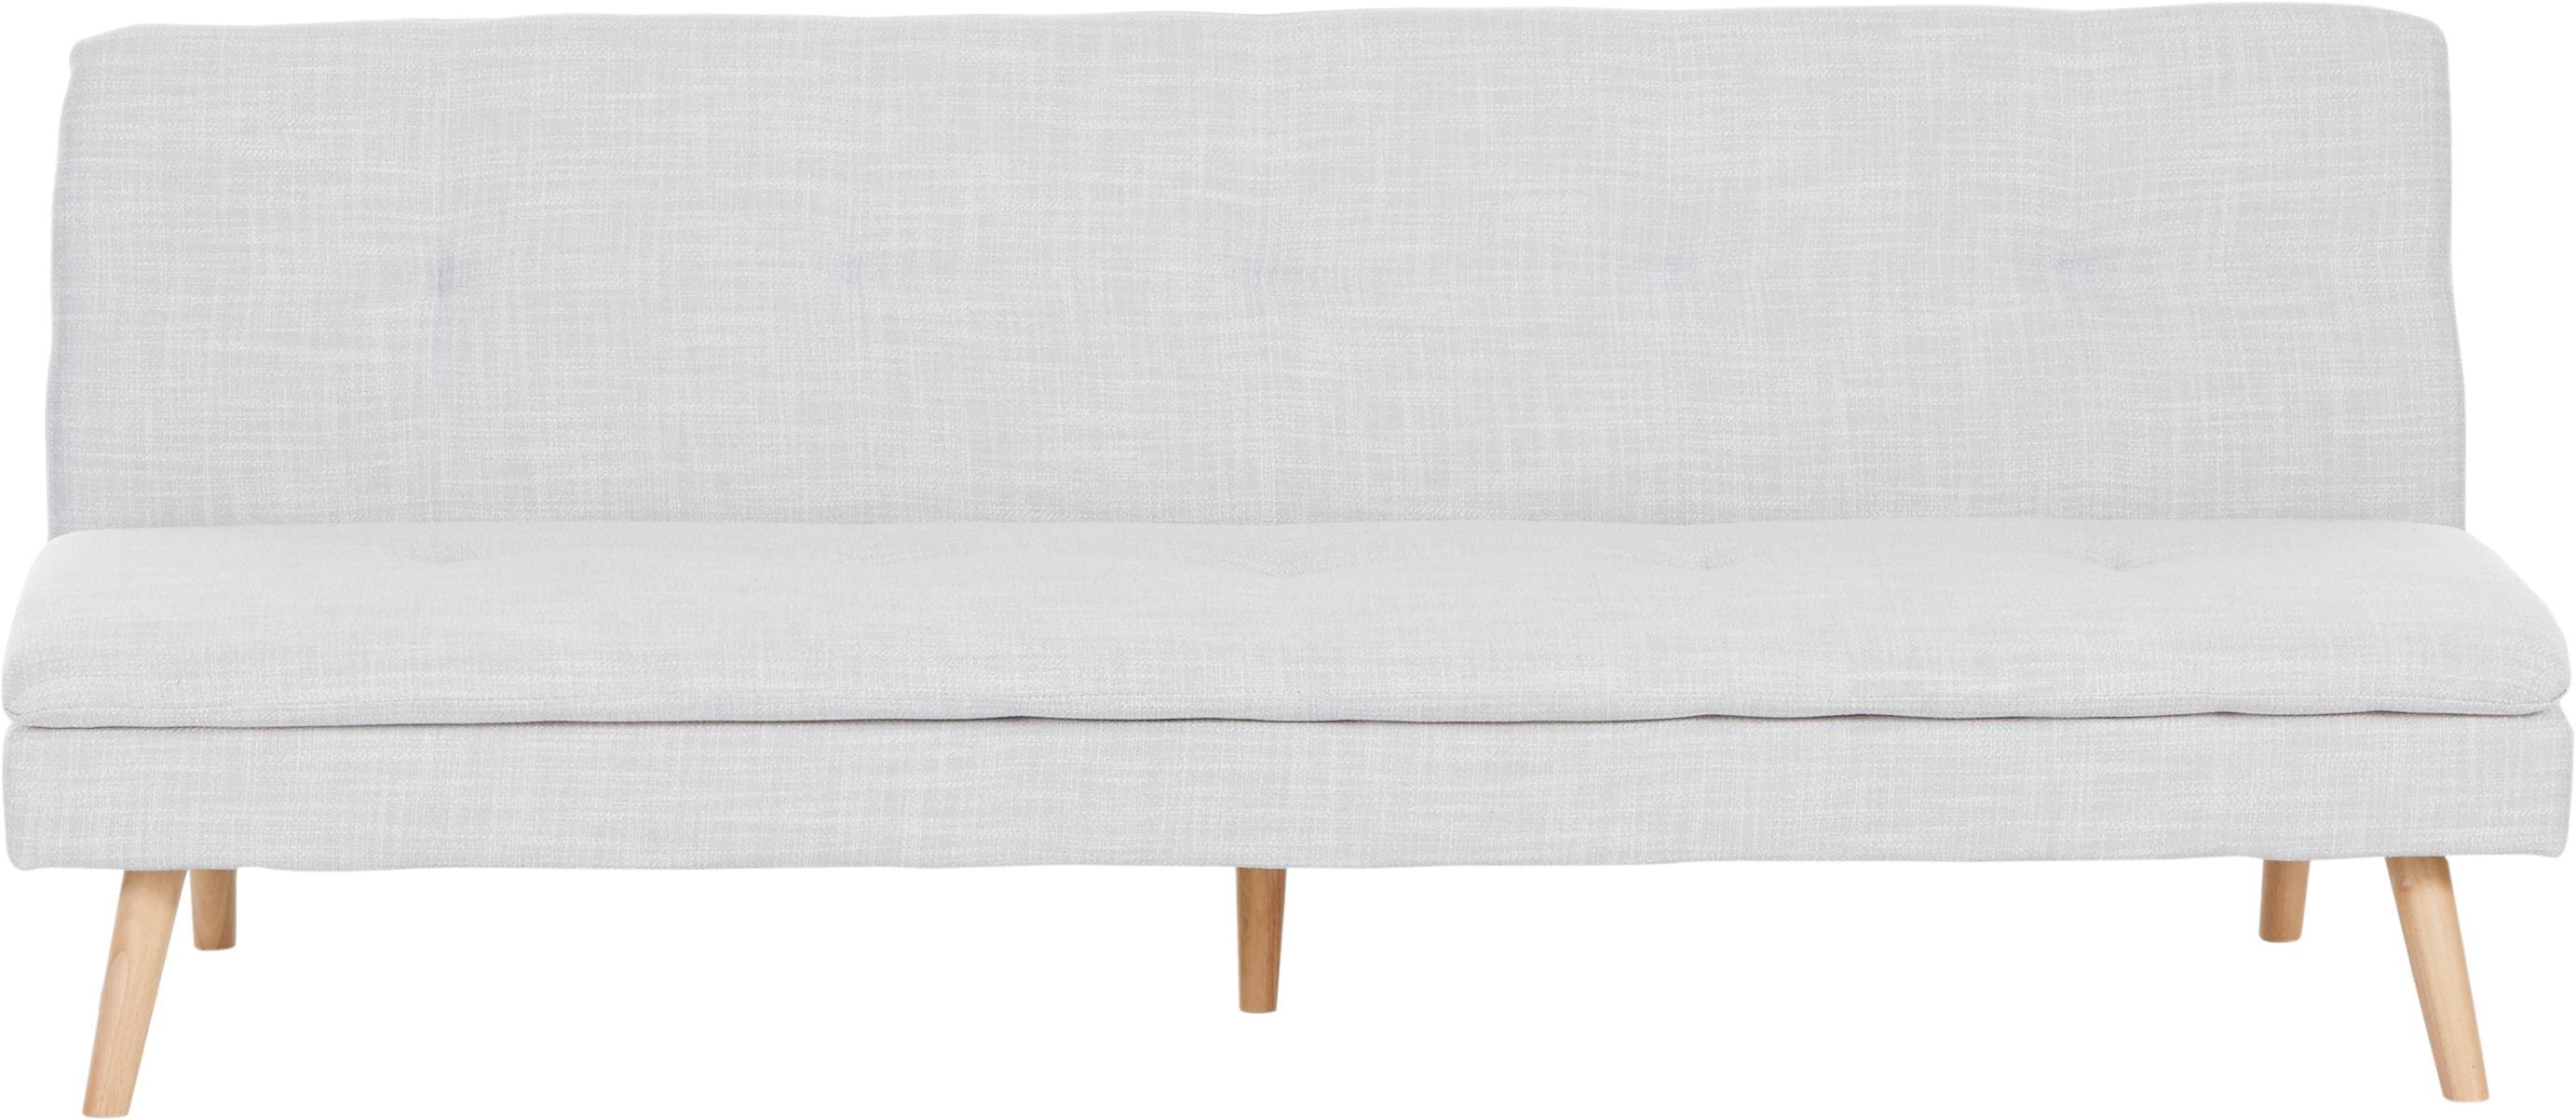 Sofá cama Amelie, Tapizado: poliéster Alta resistenci, Estructura: madera de pino Densidad 3, Patas: madera de caucho, Tejido gris claro, An 200 x Al 79 cm